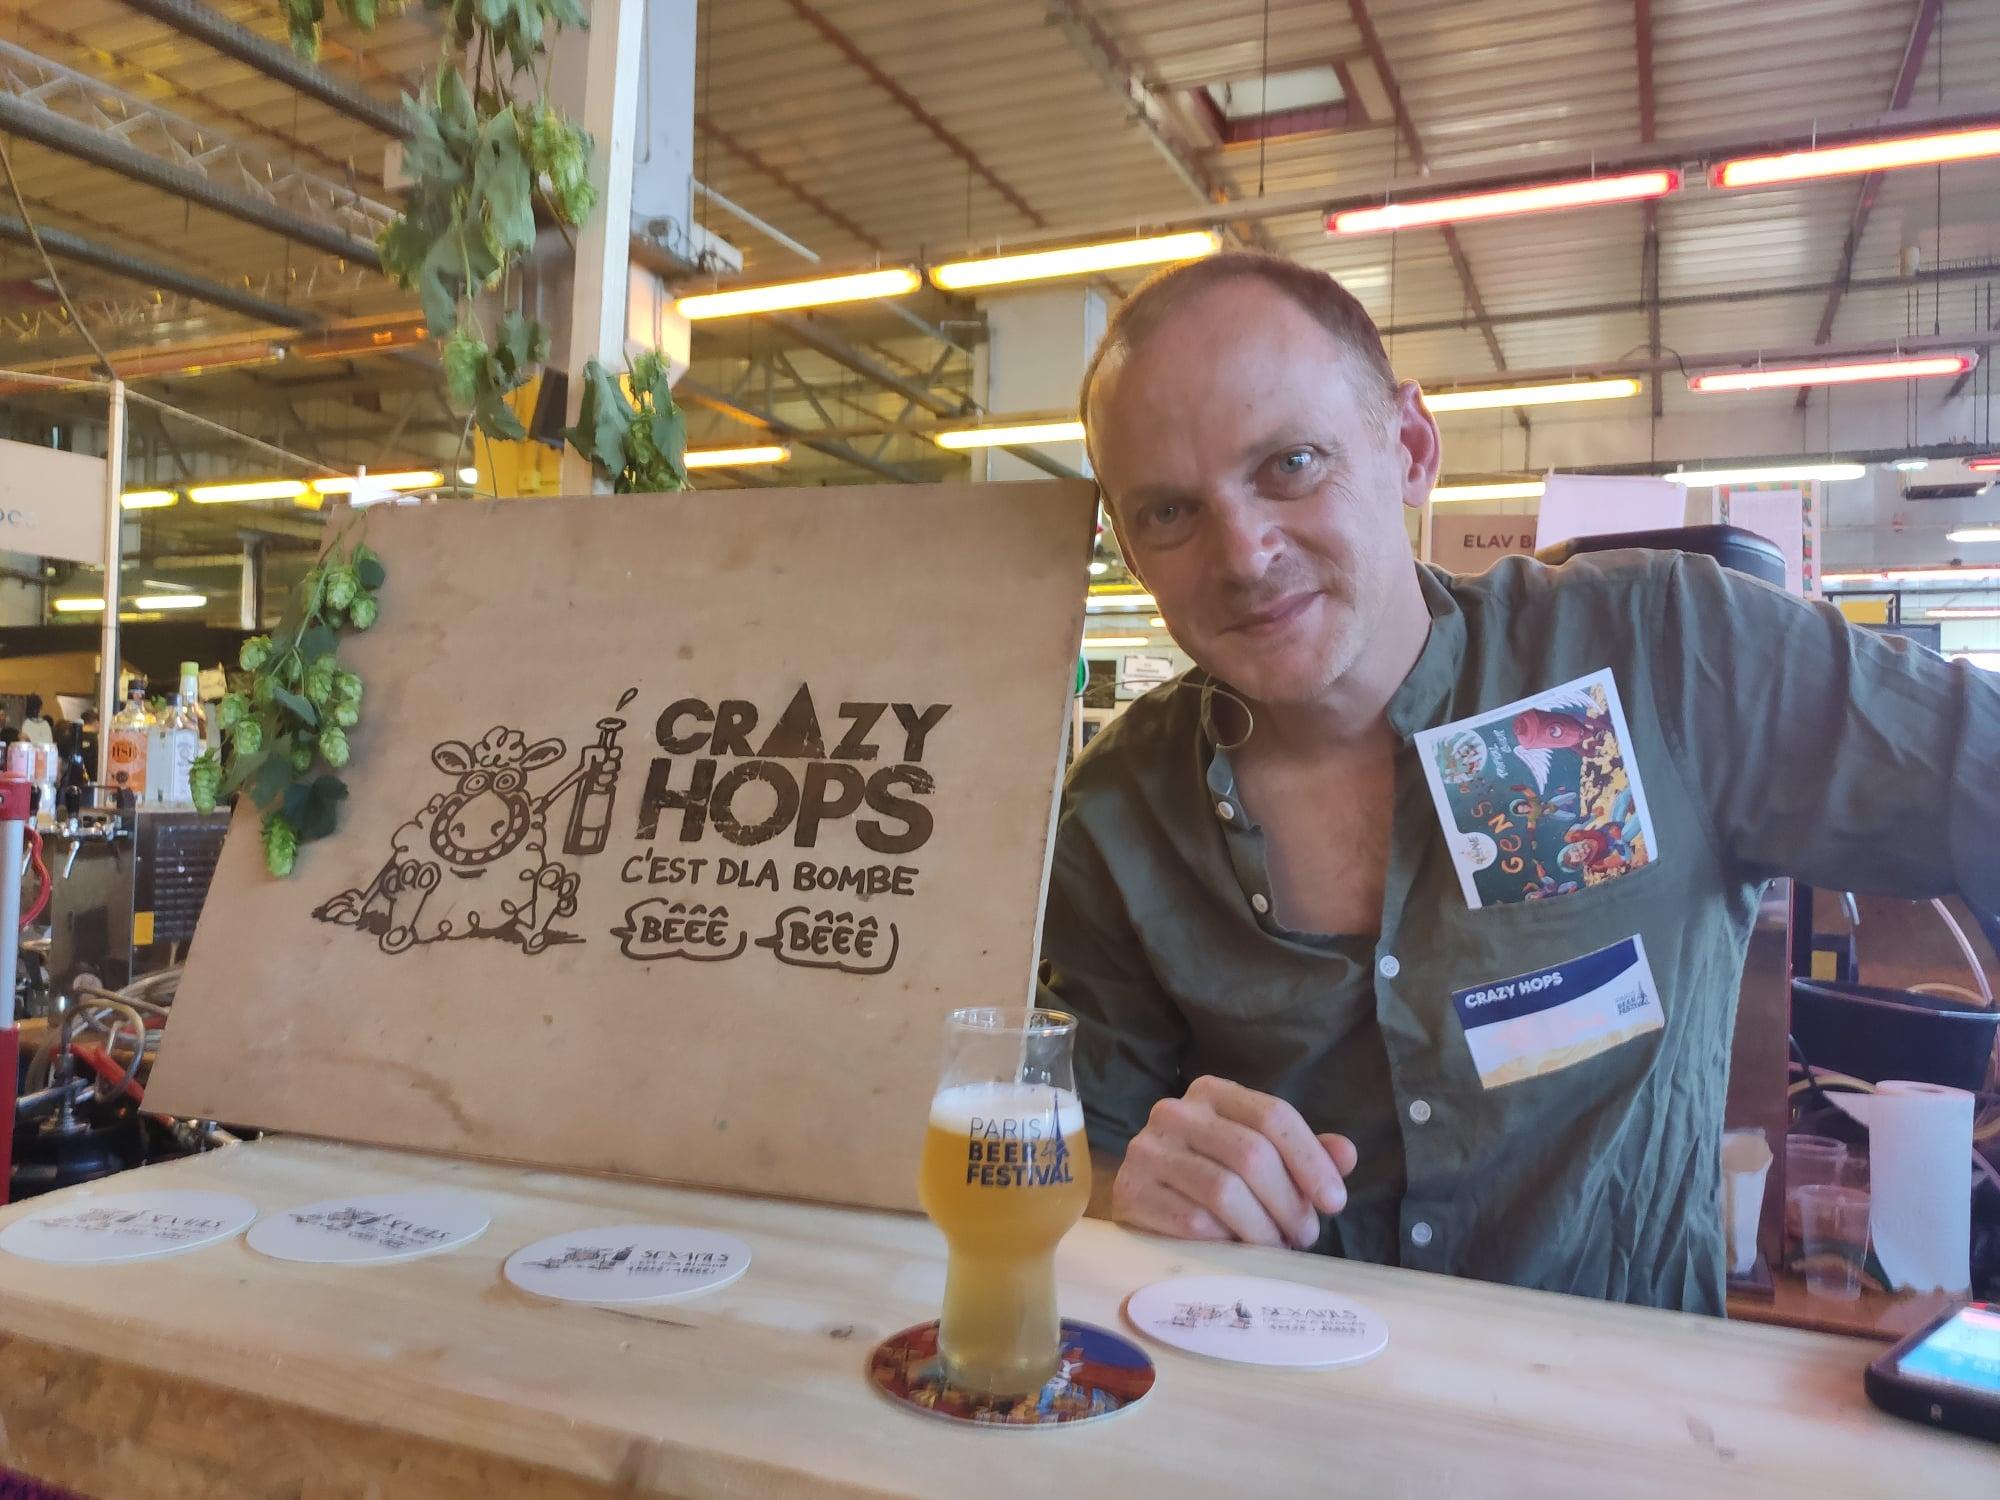 Paris Beer Festival - Crazy Hops